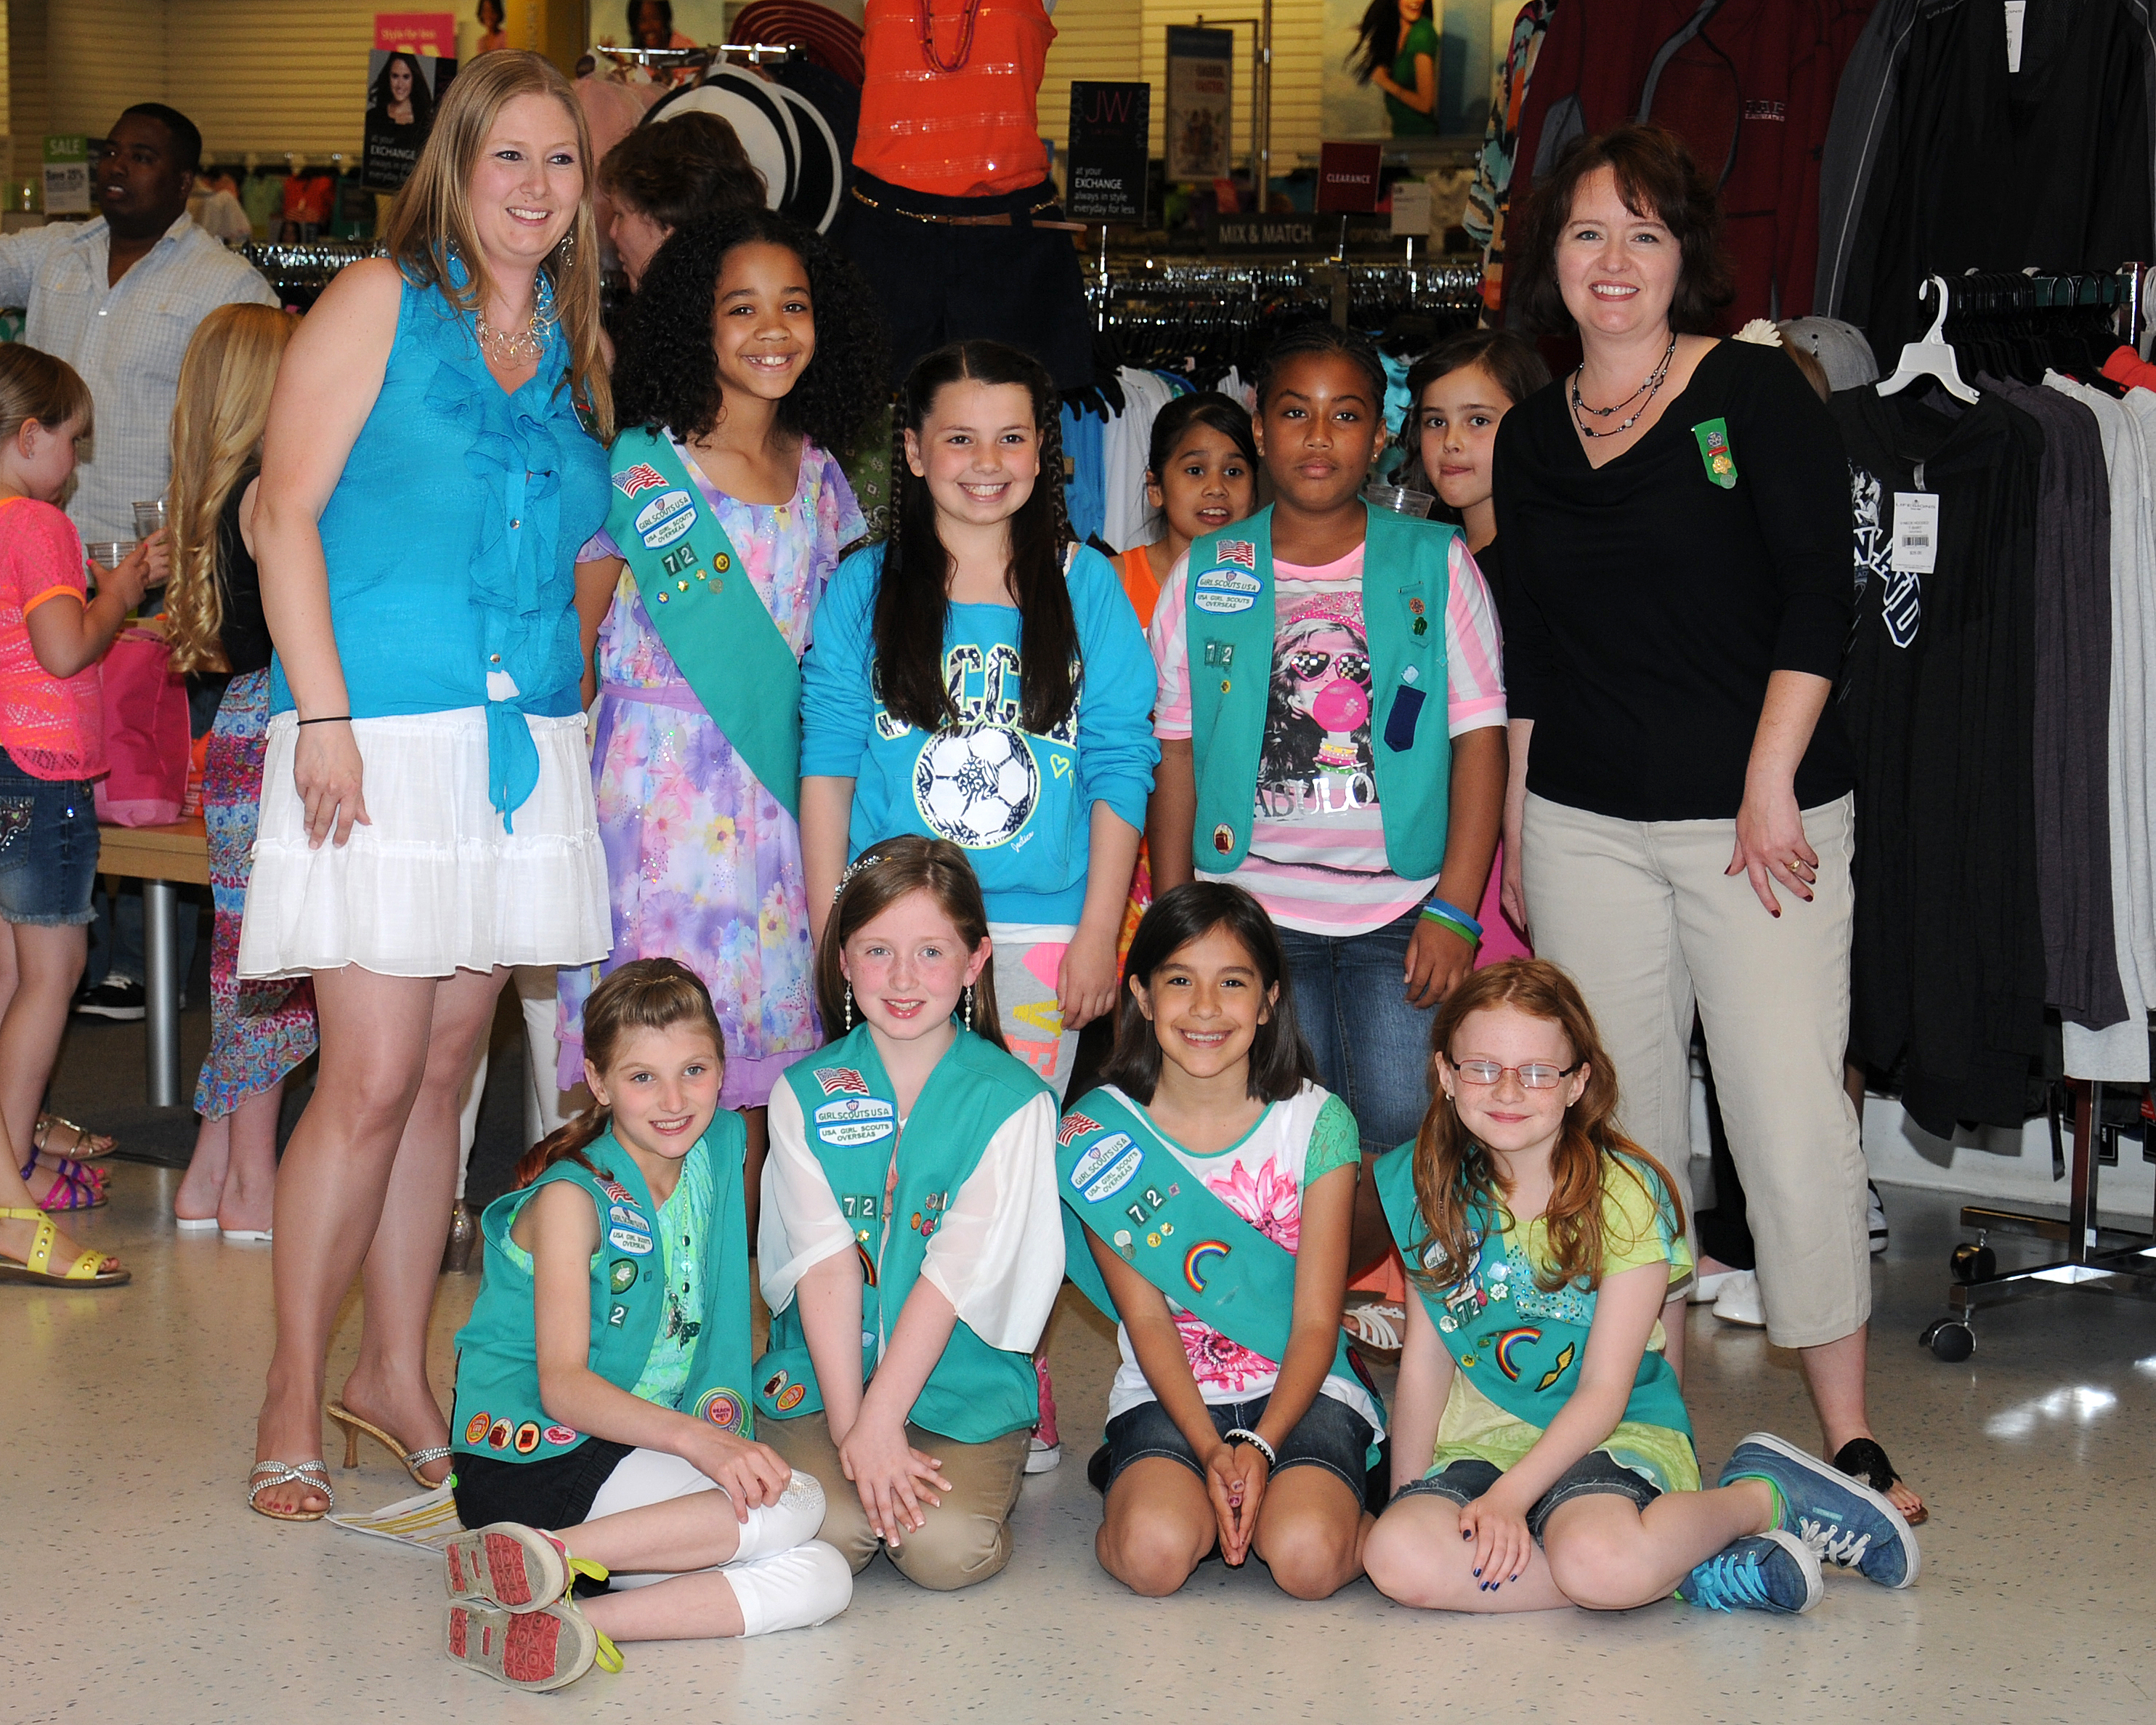 lakenheath girls Find 3544 alumni members from lakenheath american high school in lakenheath reconnect with friends and fellow graduates on classmatescom.